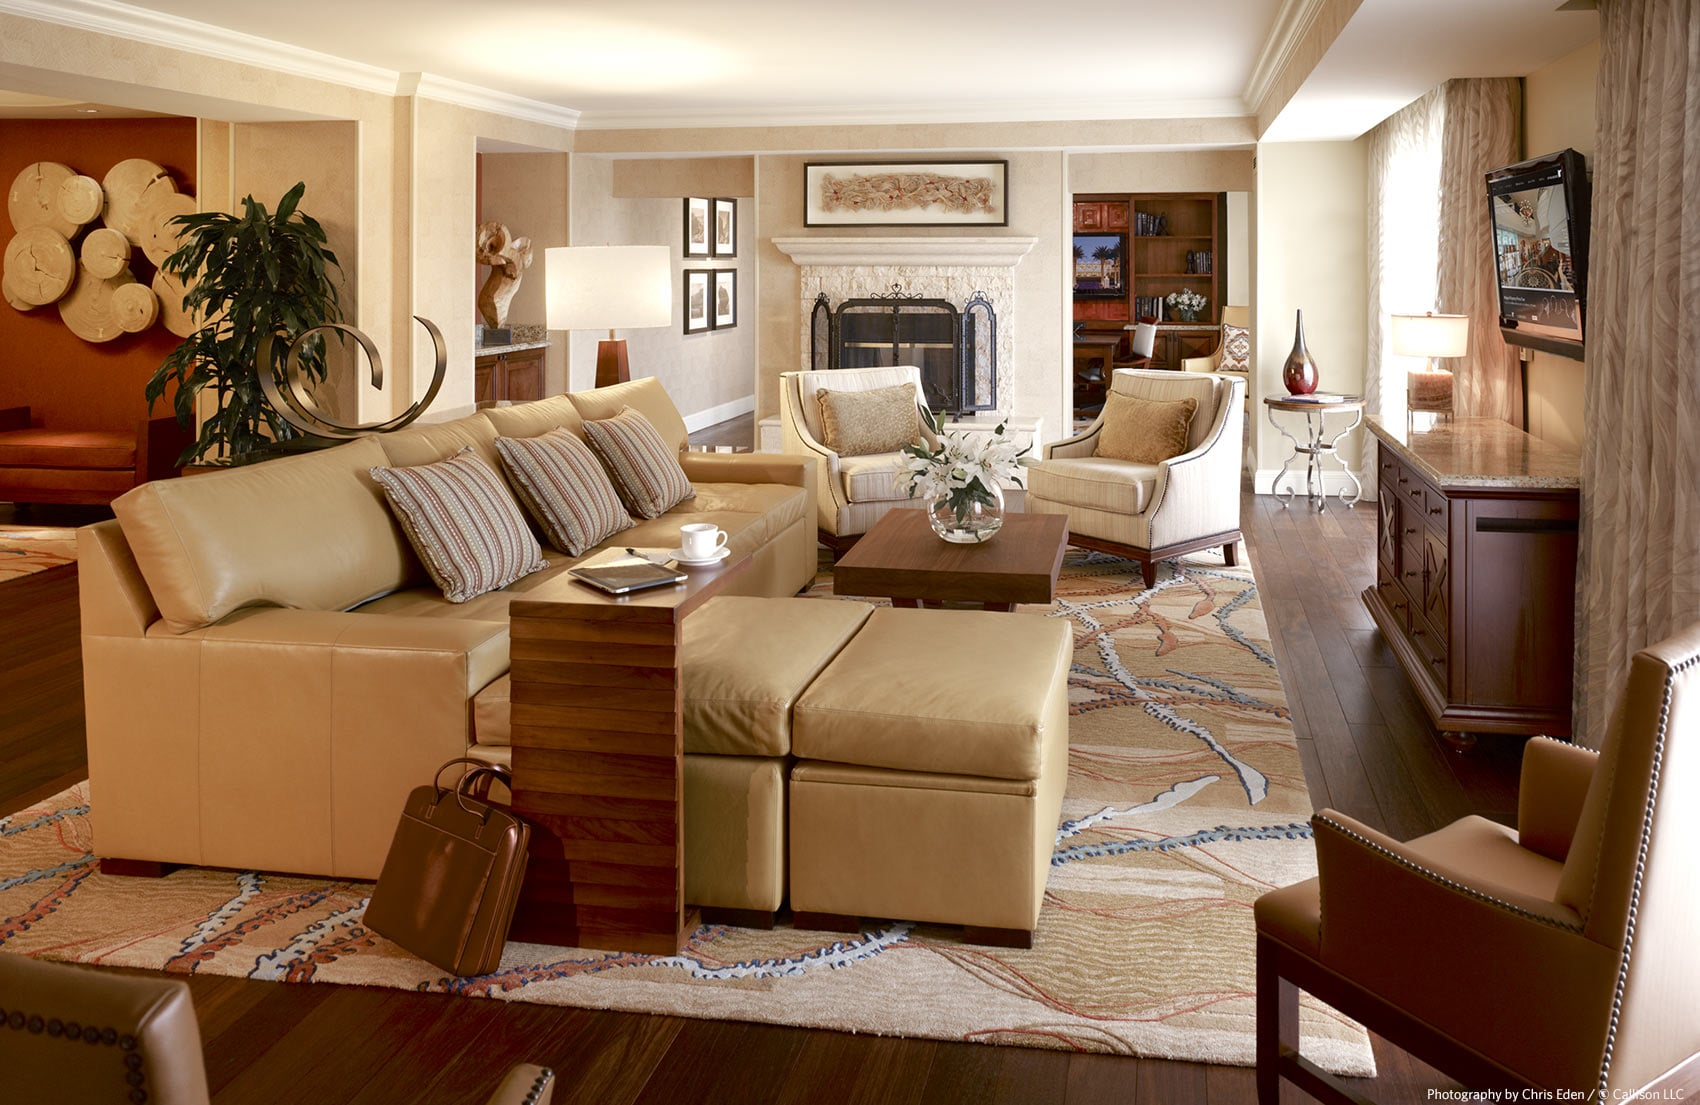 JW Marriott, Scottsdale - Suite Interior